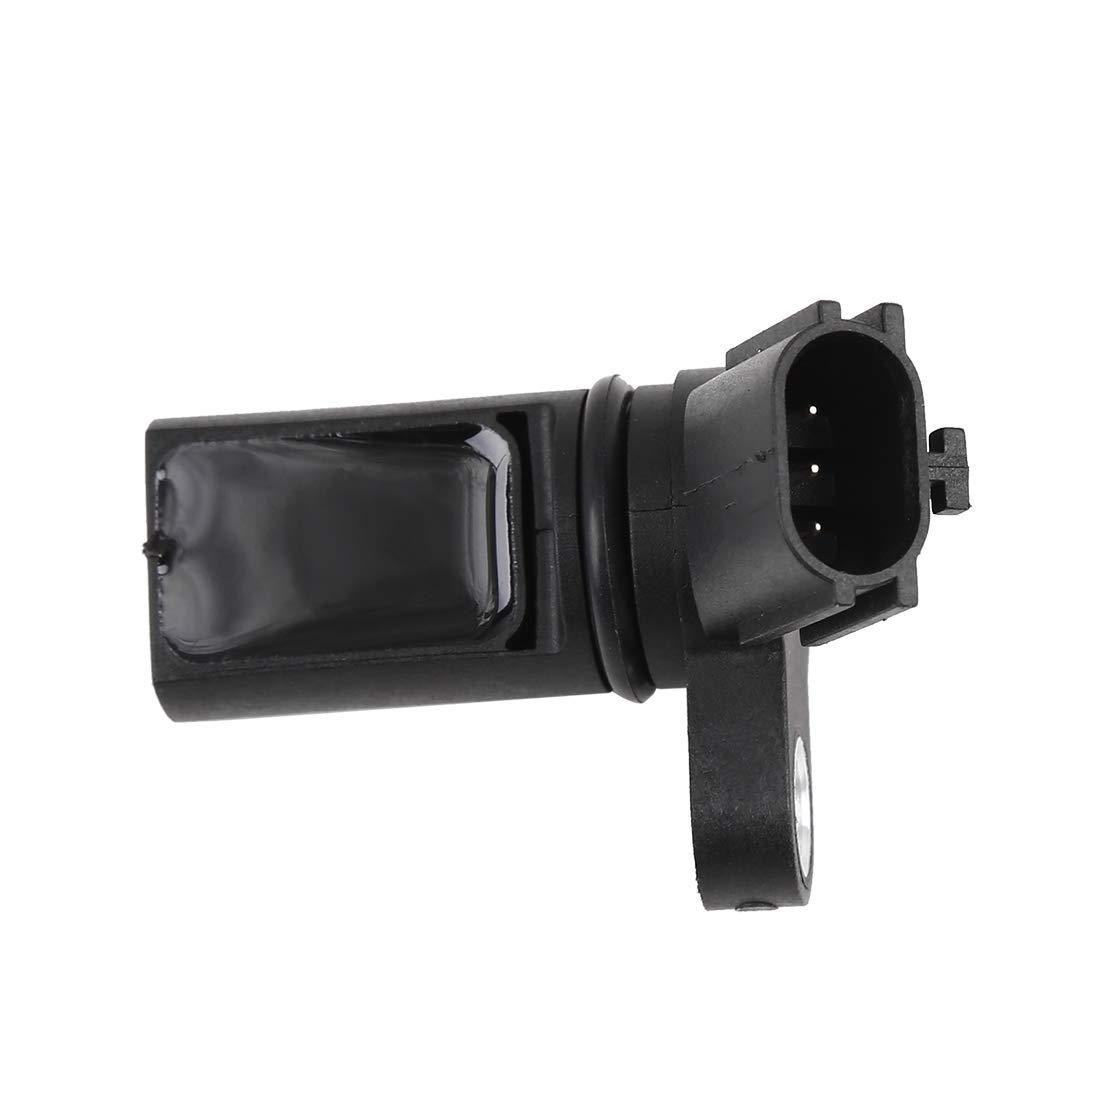 X AUTOHAUX 23731AL615 Vehicle Engine Camshaft Position Sensor for Infiniti FX35 G35 I35 Nissan 350Z Altima